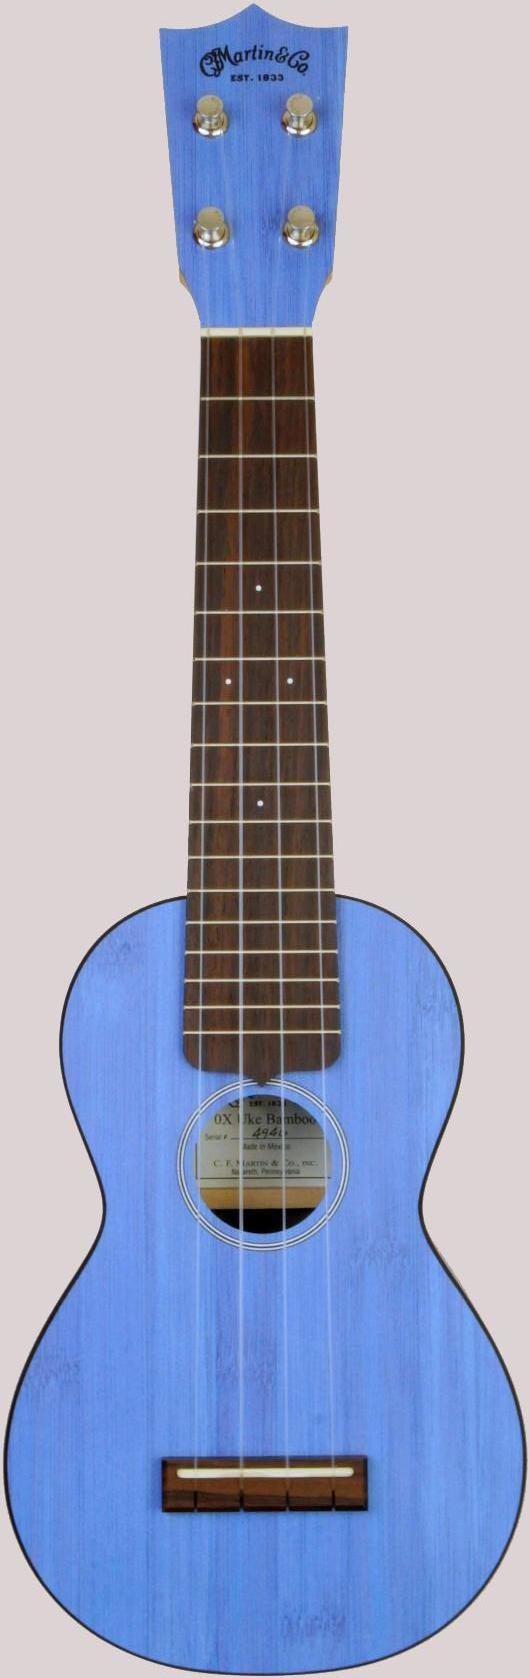 Mexican Martin 0 xb bamboo soprano ukulele